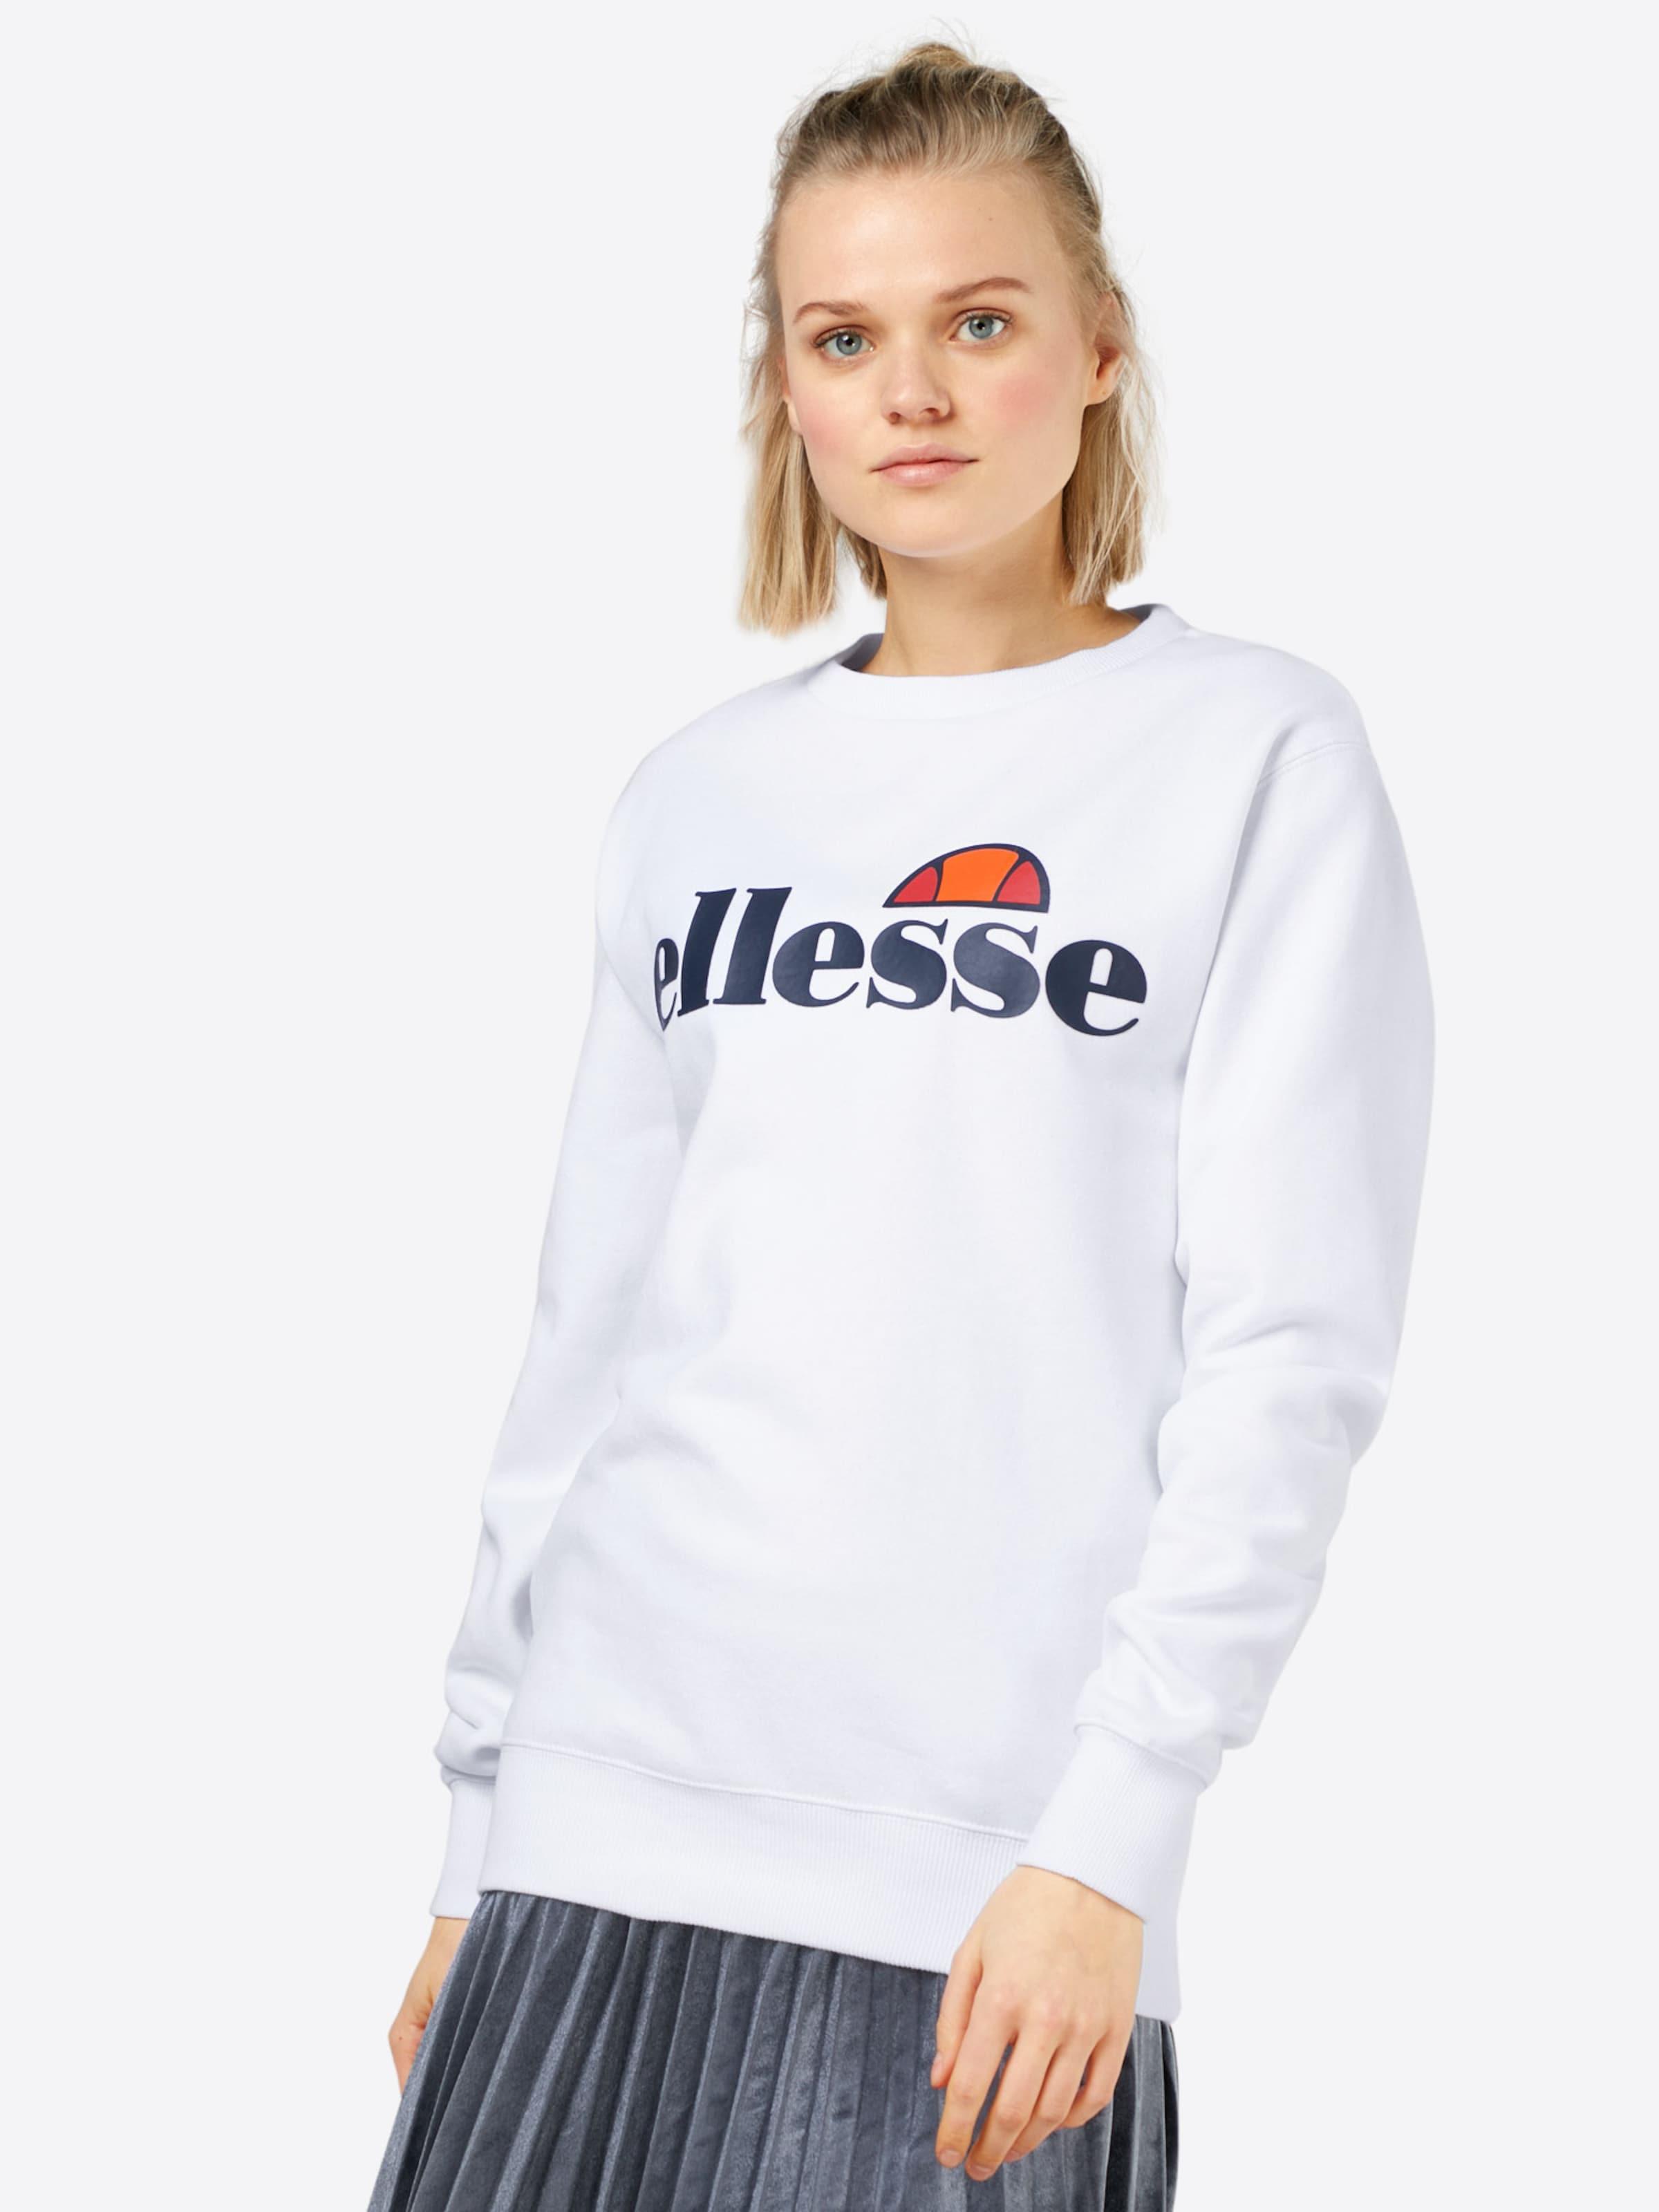 Blanc 'agata' En shirt Ellesse Sweat dCoexB